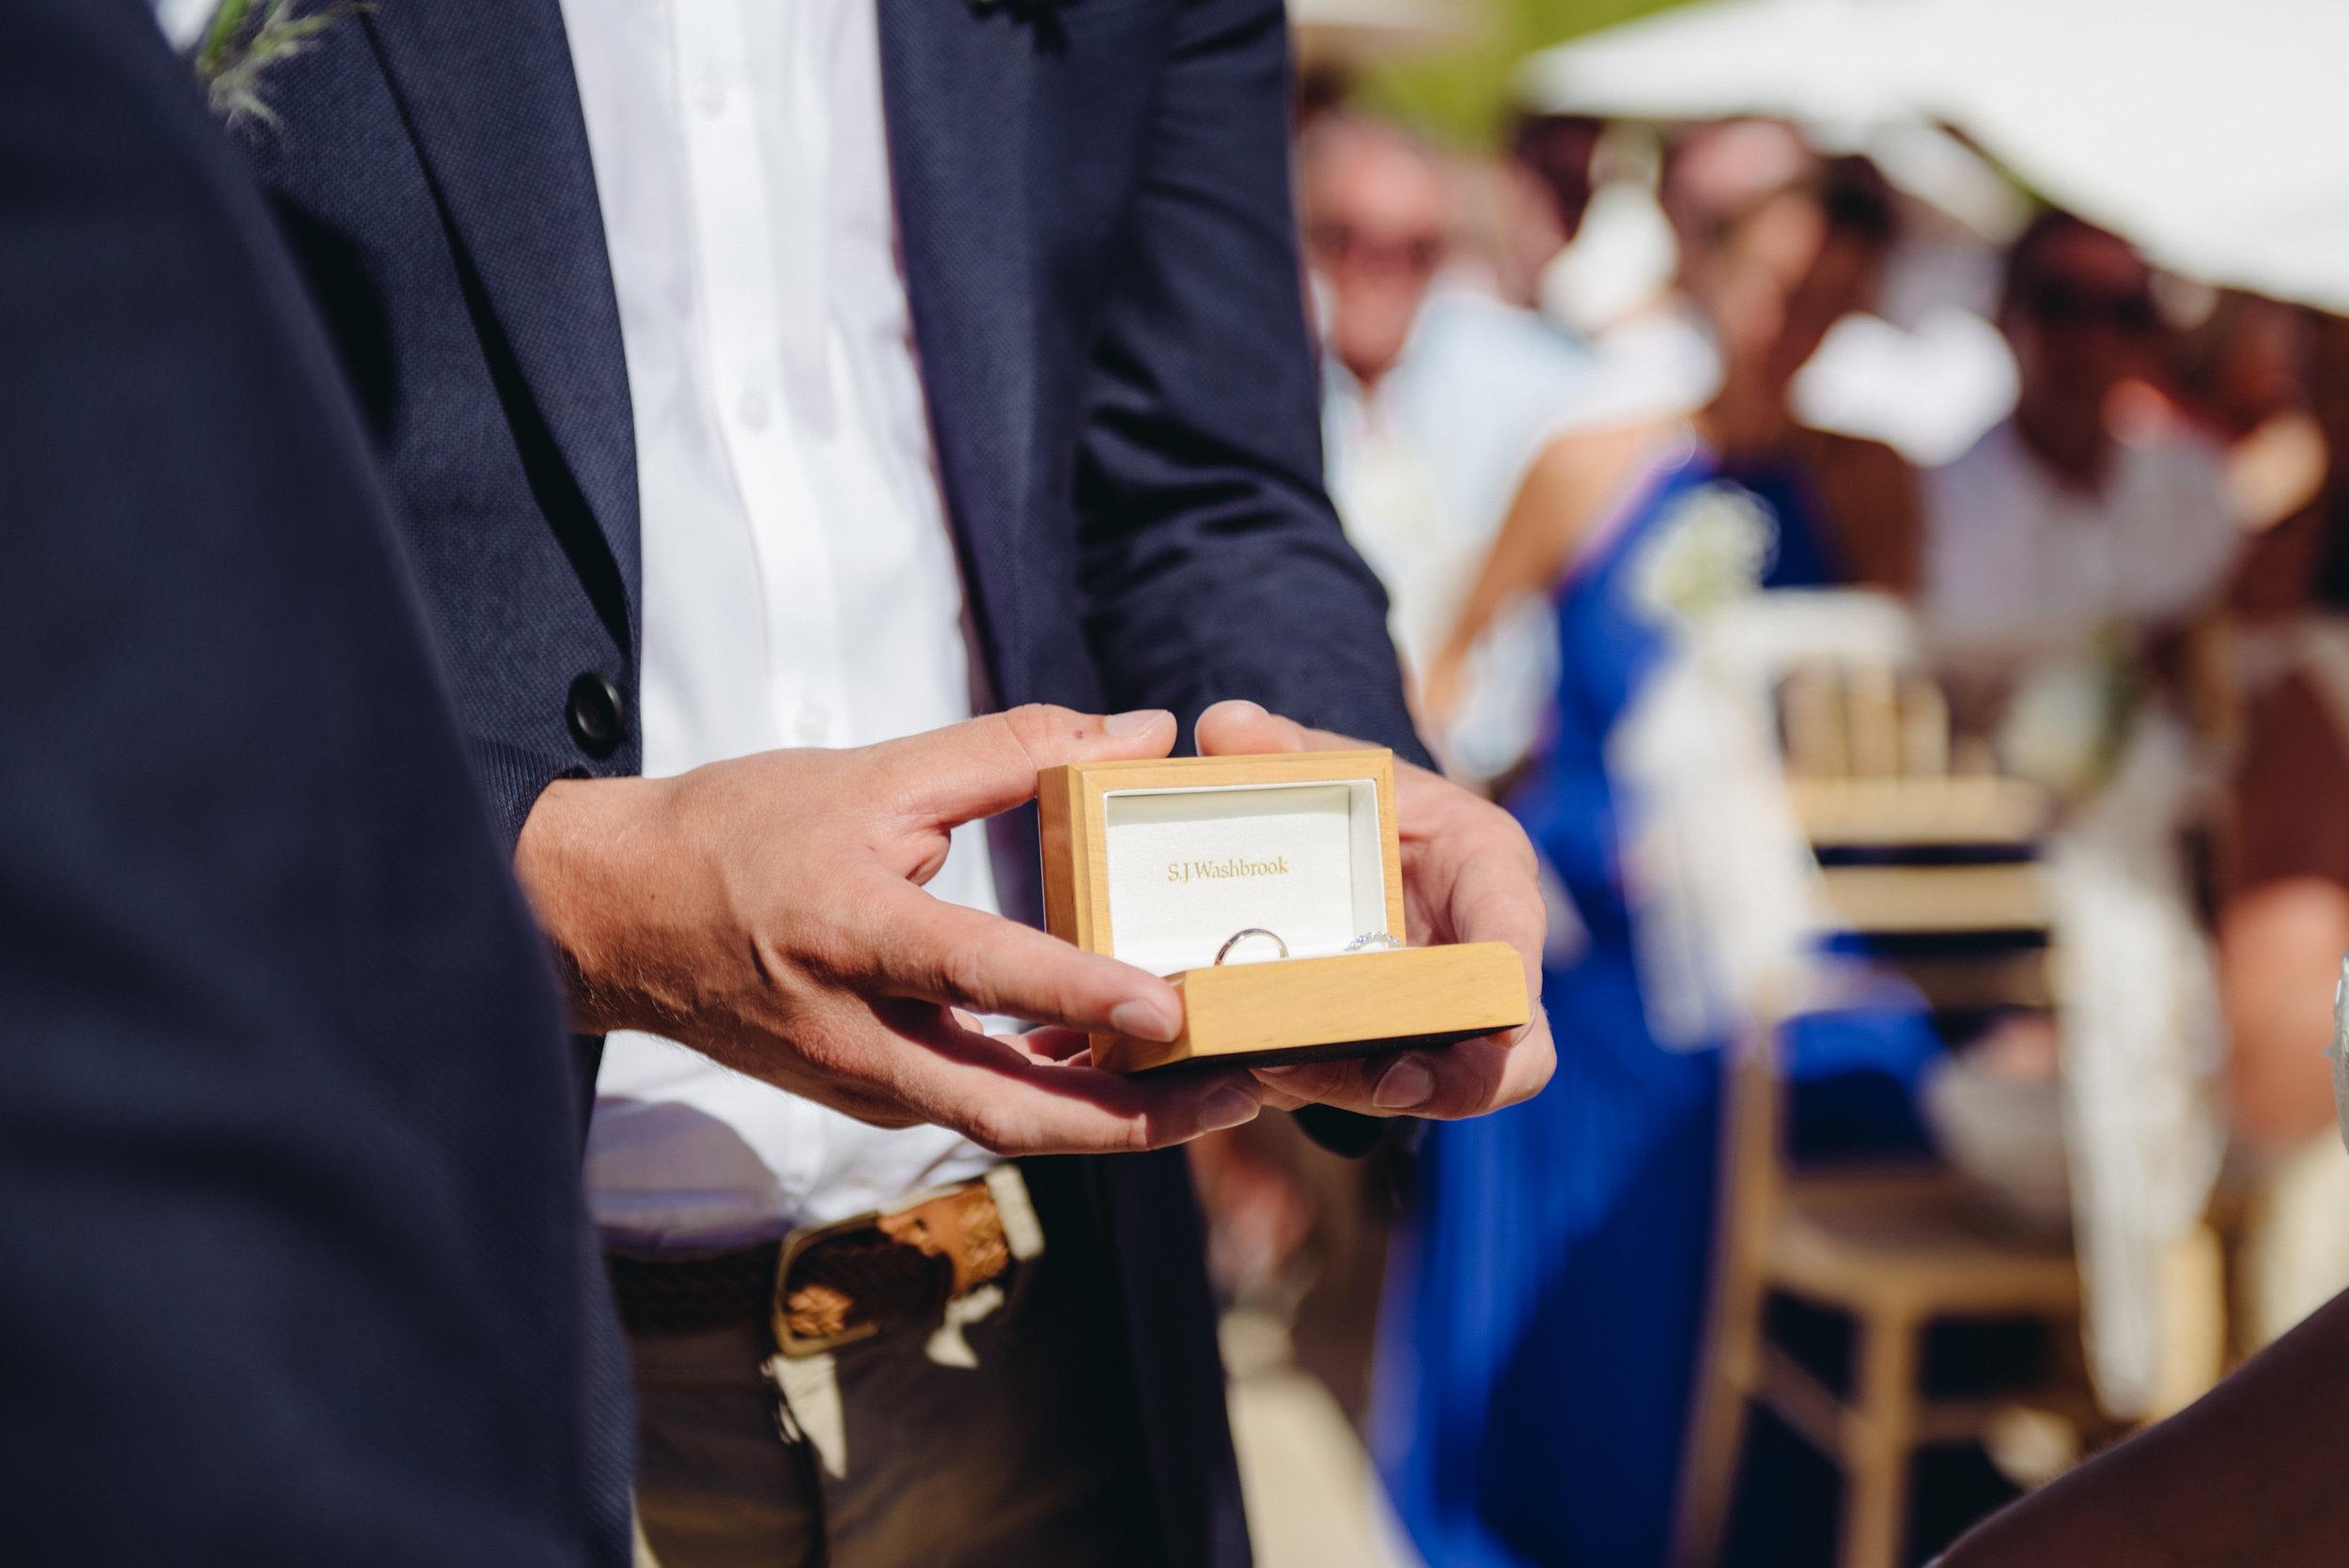 0076-IBIZA-ELIXIR-BEACH-CLUB-WEDDING-PHOTOGRAPHY-ALTERNATIVE-WEDDING-PHOTOGRAPHY.JPG